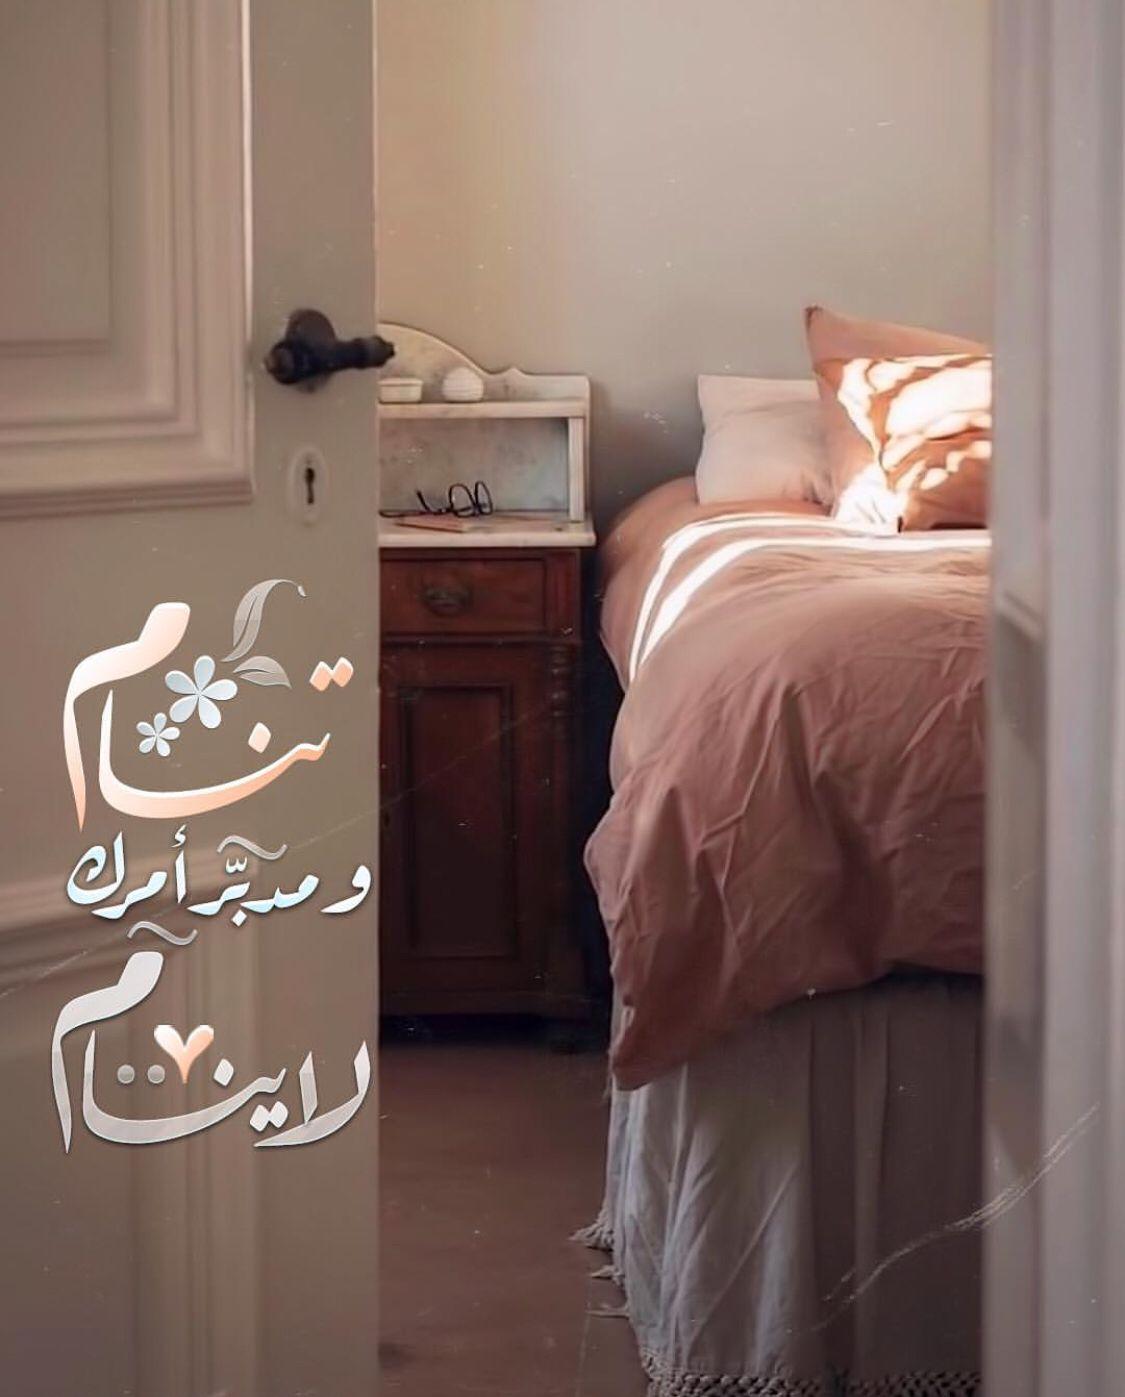 Pin By صورة و كلمة On تصبح على خير Good Night Islamic Images Islamic Pictures Allah